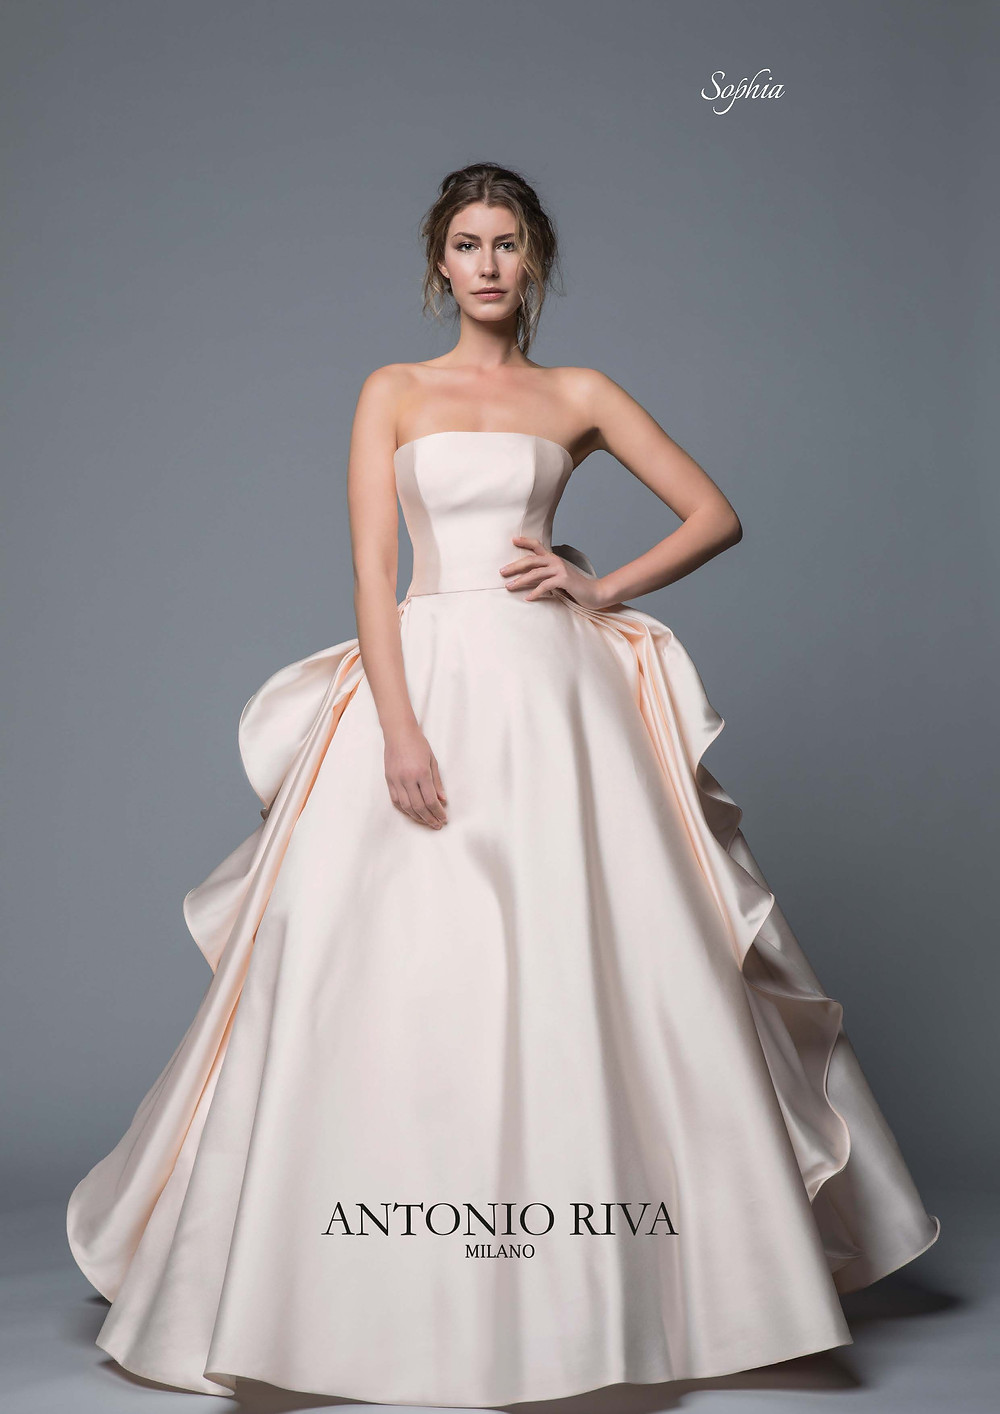 An Antonio Riva 2020 strapless blush silk ball gown wedding dress